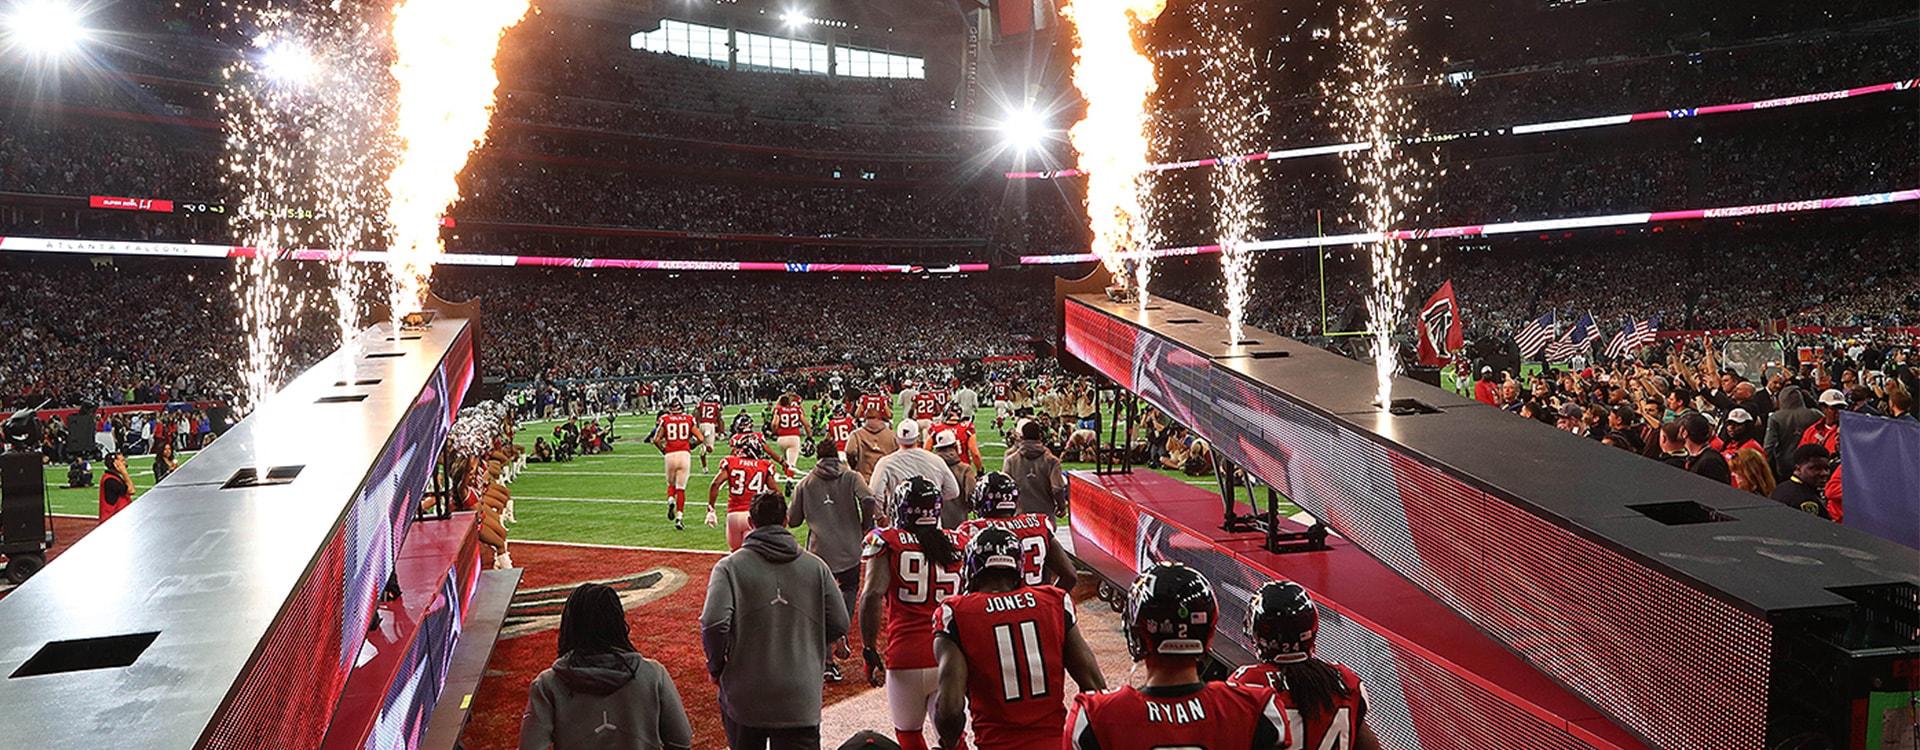 Super Bowl Reise